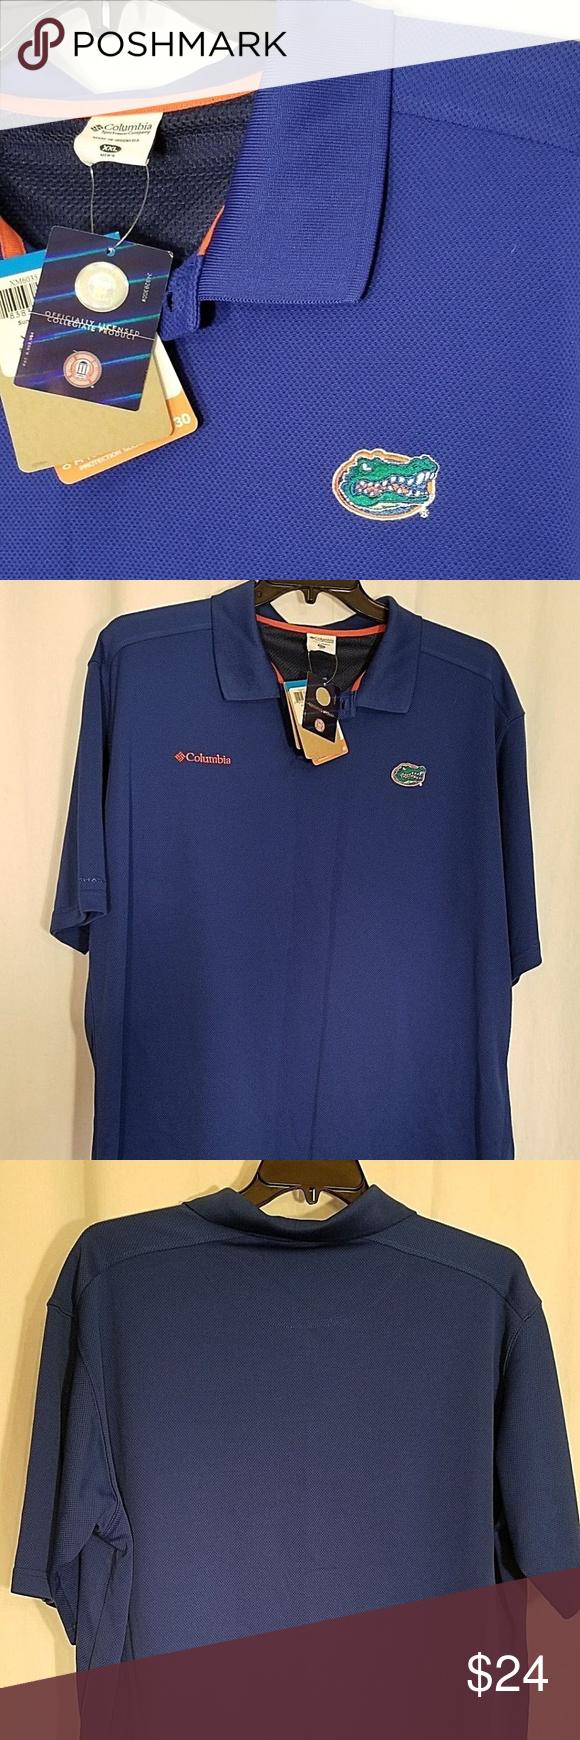 Uf Florida Gators Polo Shirt Men Xxl Women 2x Nwt My Posh Closet